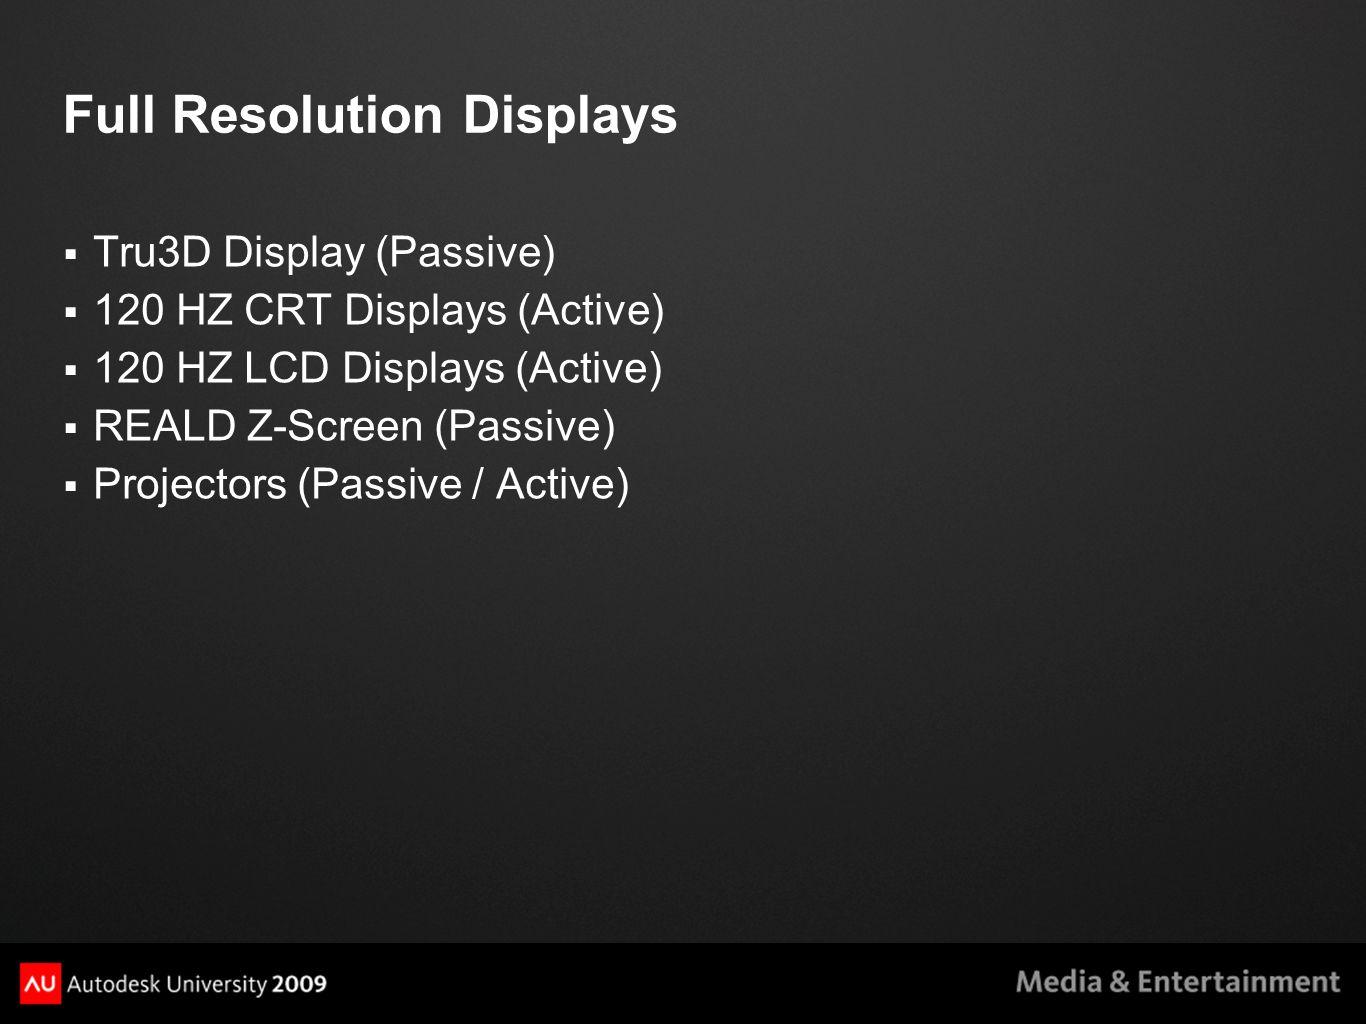 Full Resolution Displays  Tru3D Display (Passive)  120 HZ CRT Displays (Active)  120 HZ LCD Displays (Active)  REALD Z-Screen (Passive)  Projectors (Passive / Active)